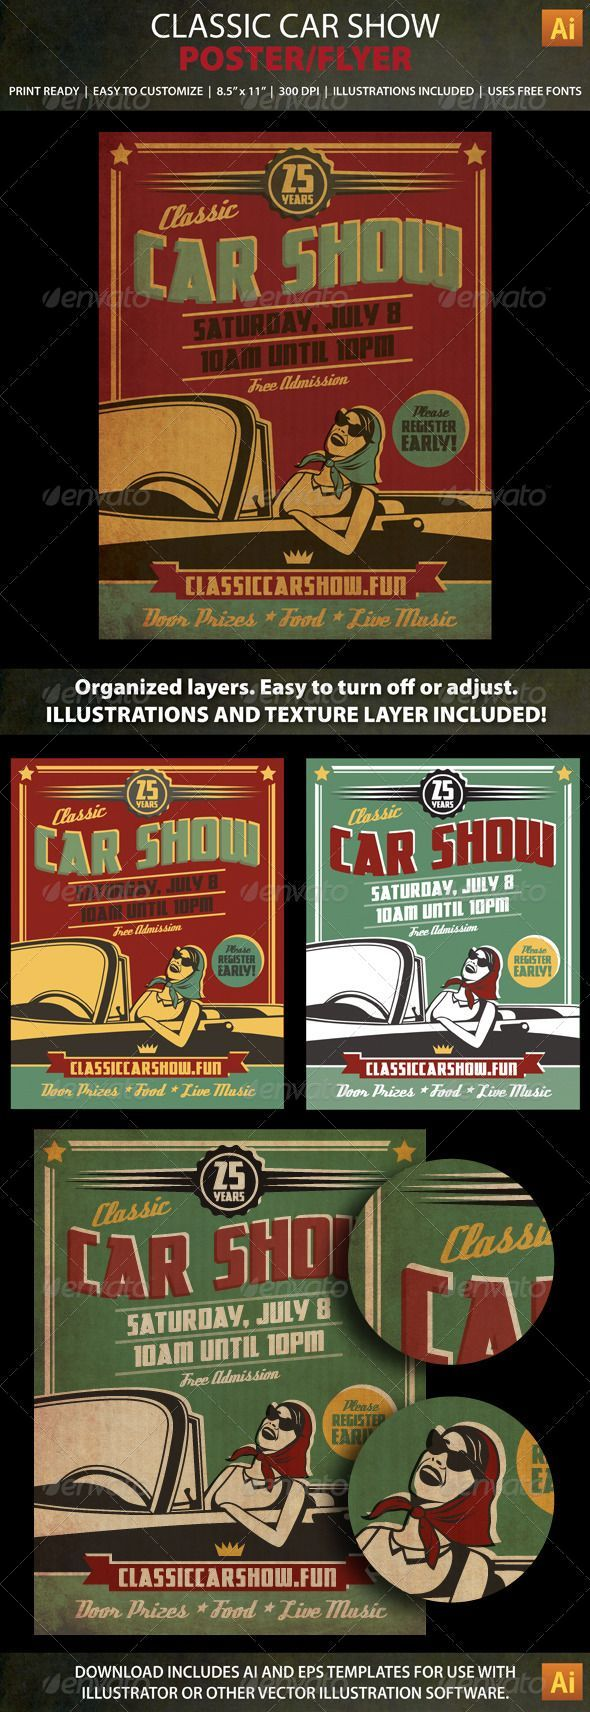 Classic Car Show Event Poster / Flyer Classic car show